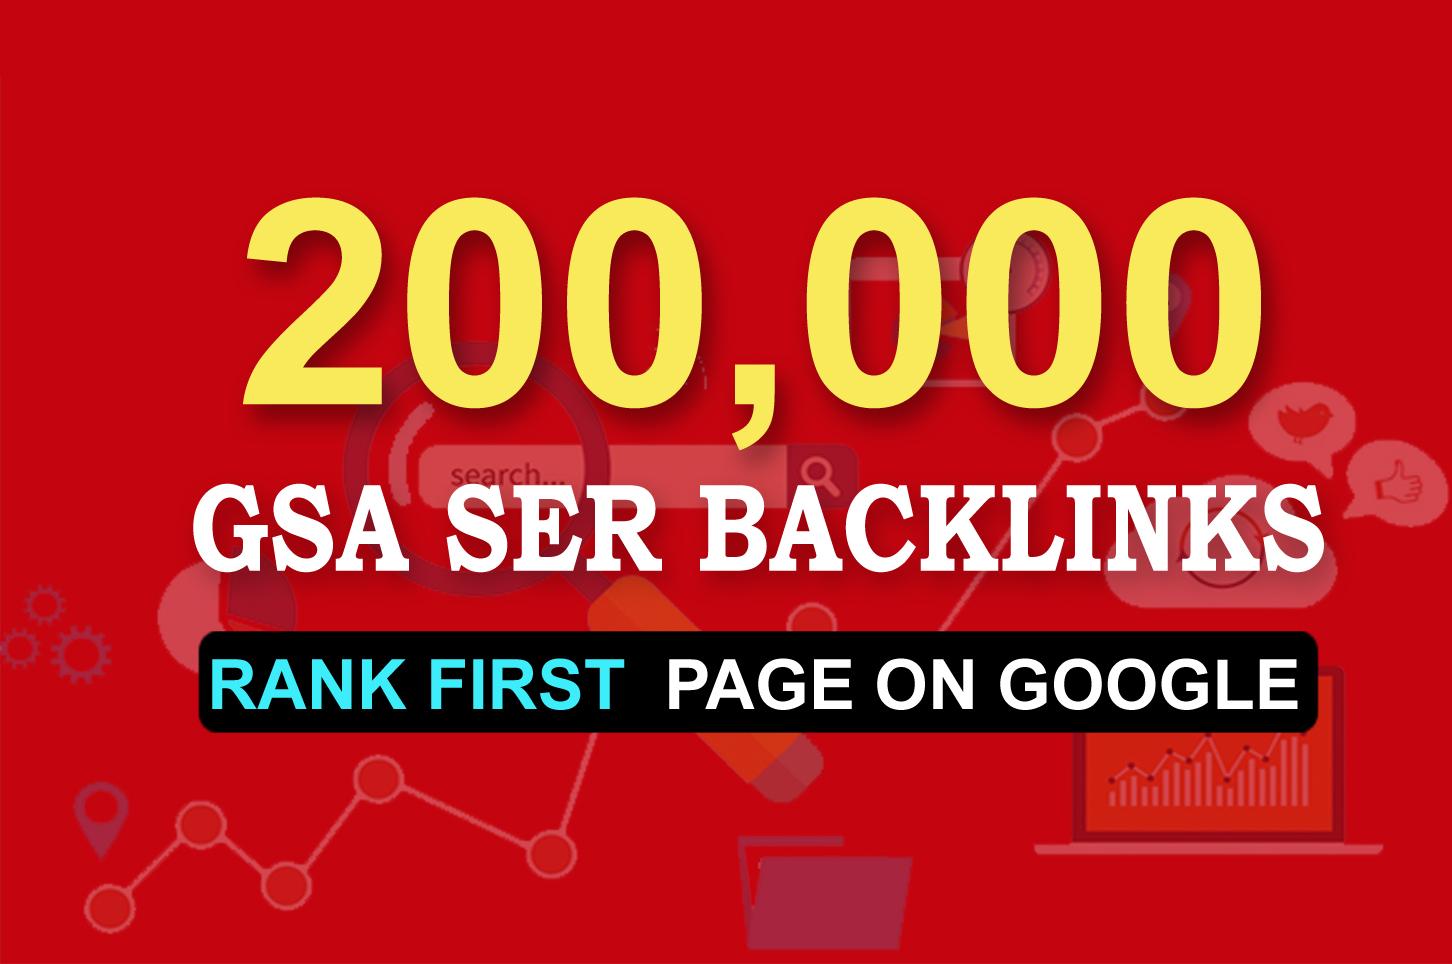 Get 1st page on Google by 200,000 GSA Ser Backlinks